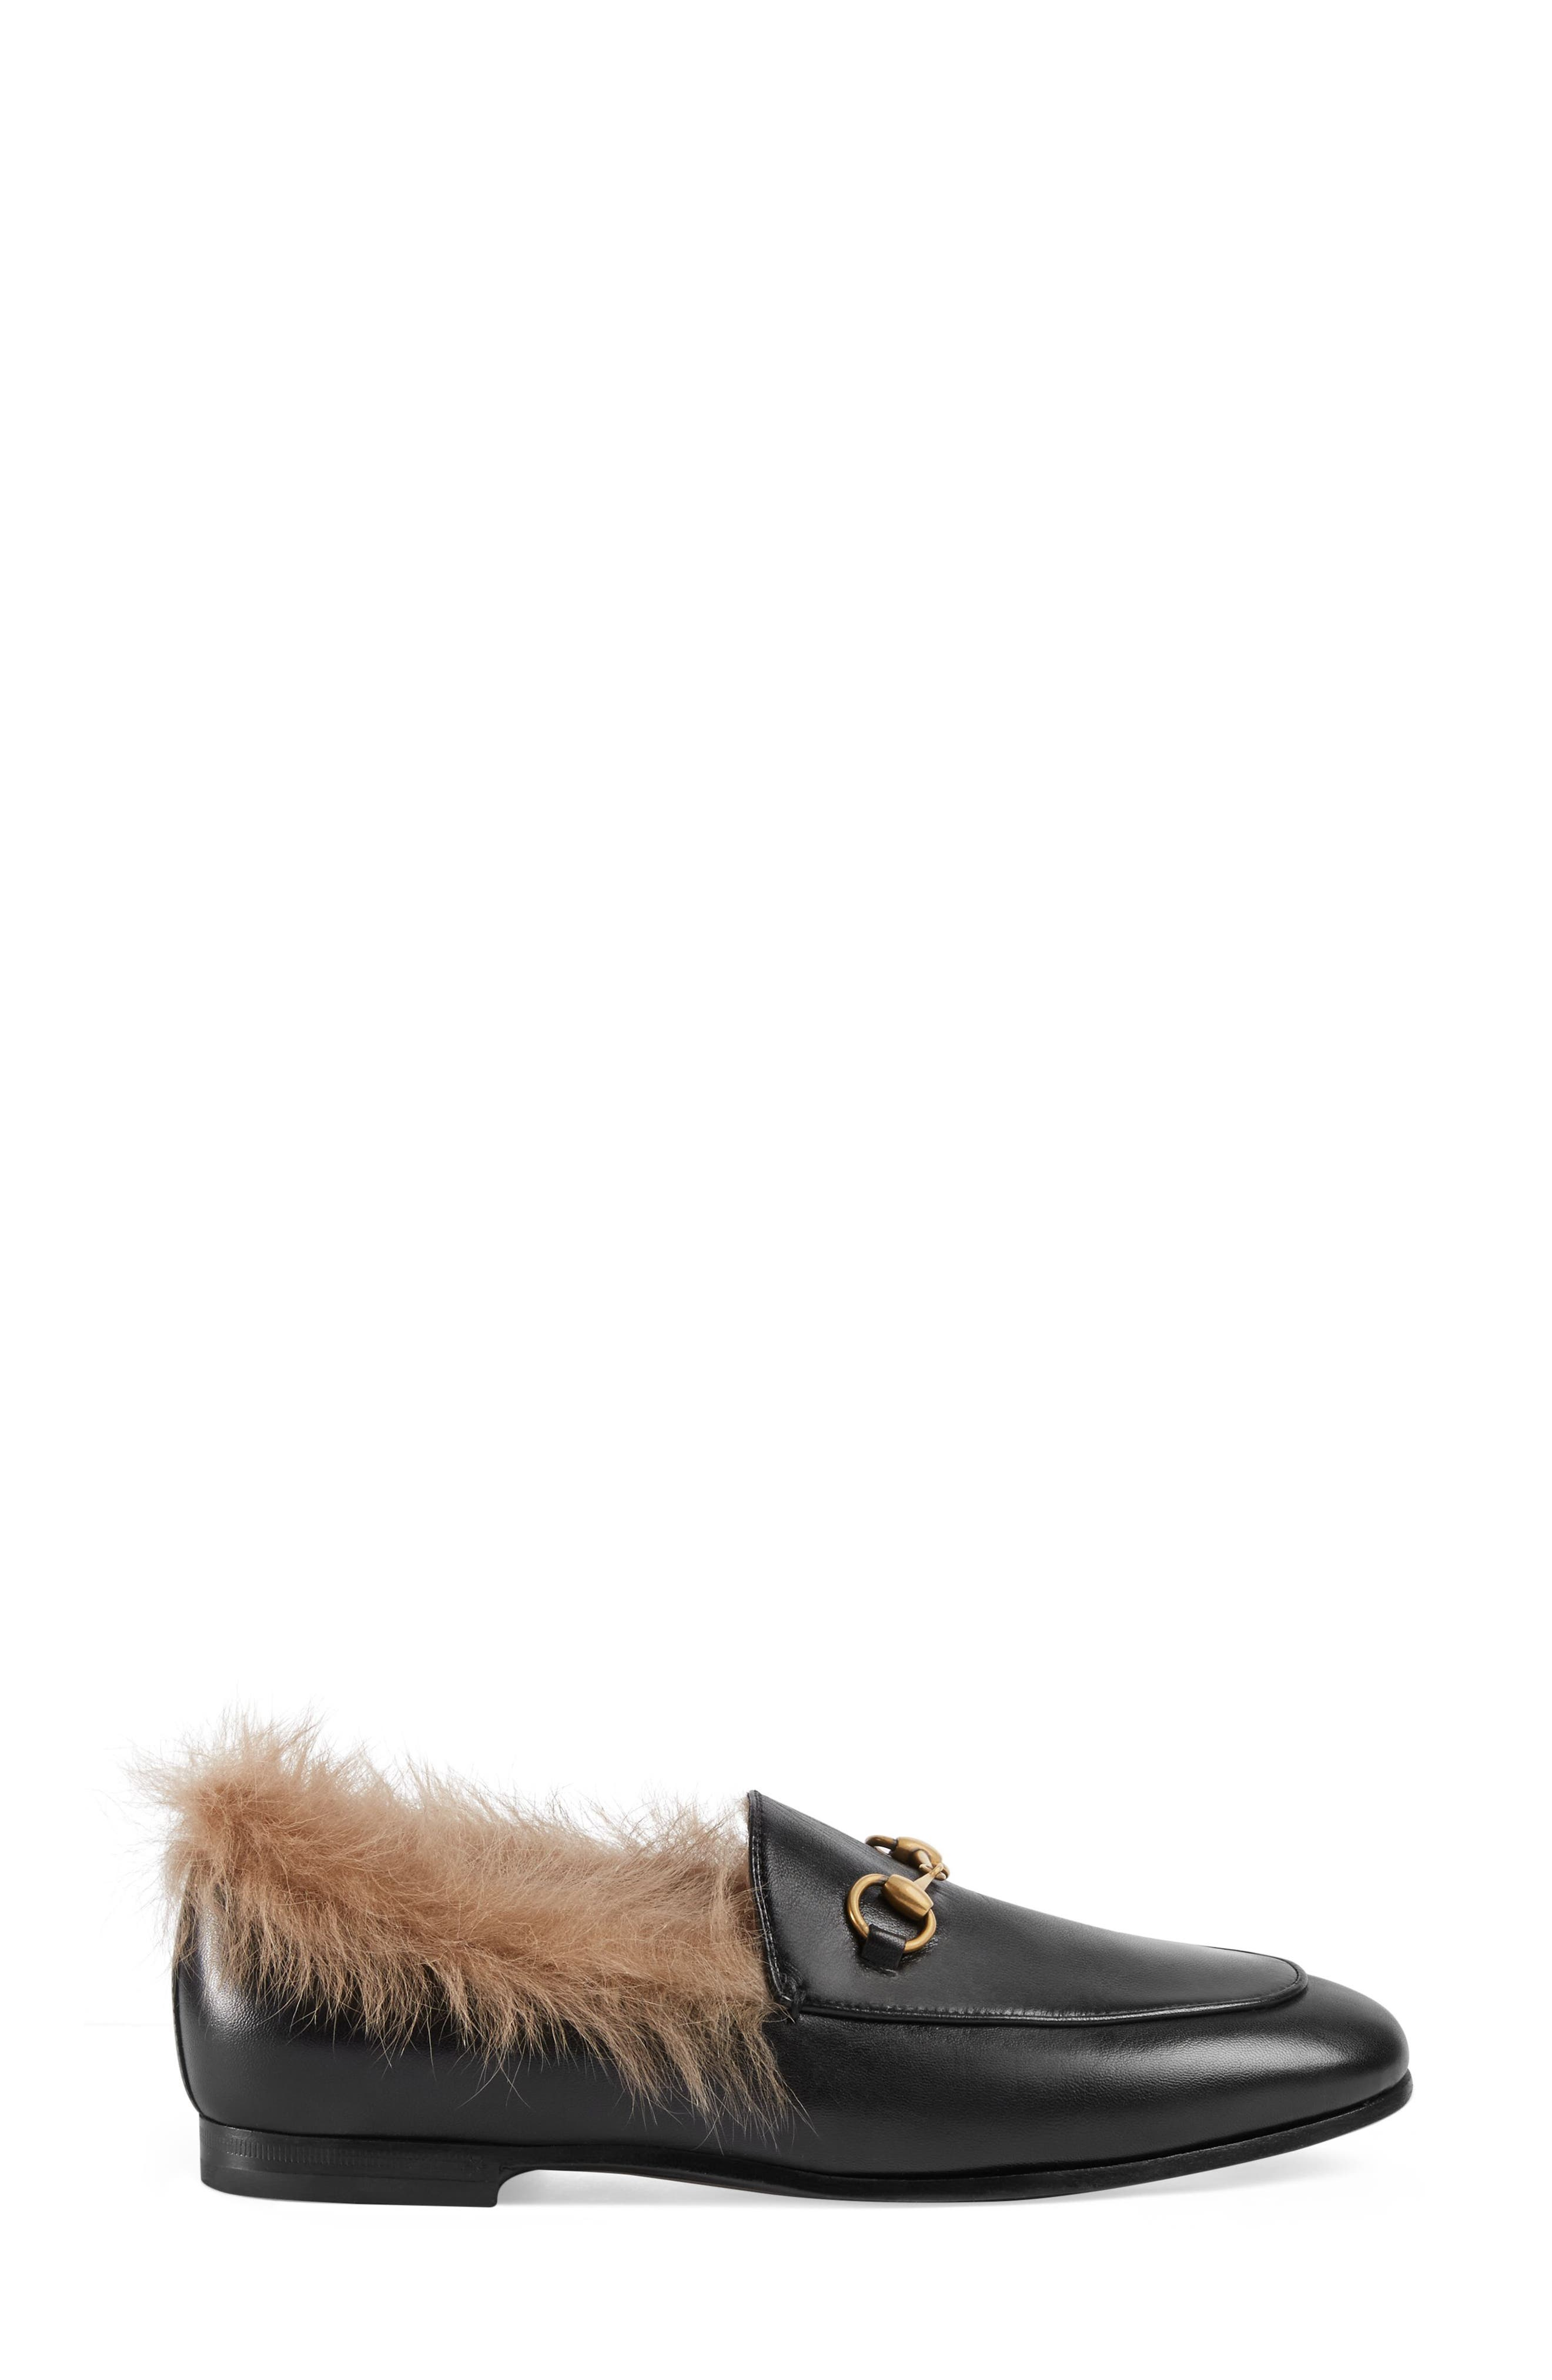 Jordaan Genuine Shearling Lining Loafer,                             Alternate thumbnail 2, color,                             Black